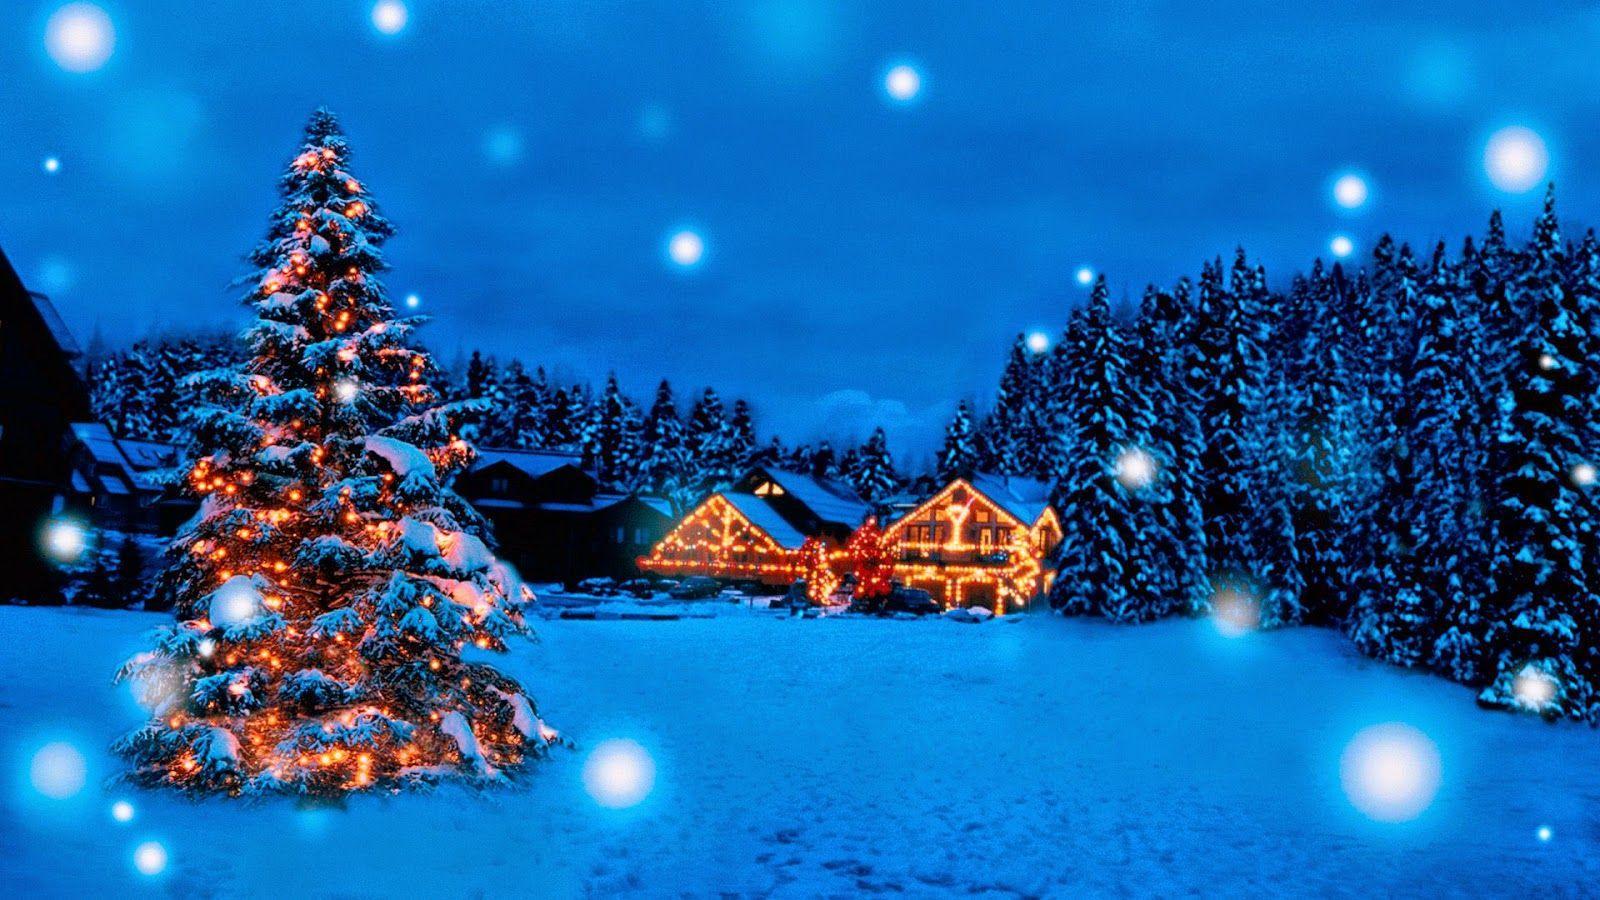 Christmas Desktop Wallpapers Top Free Christmas Desktop